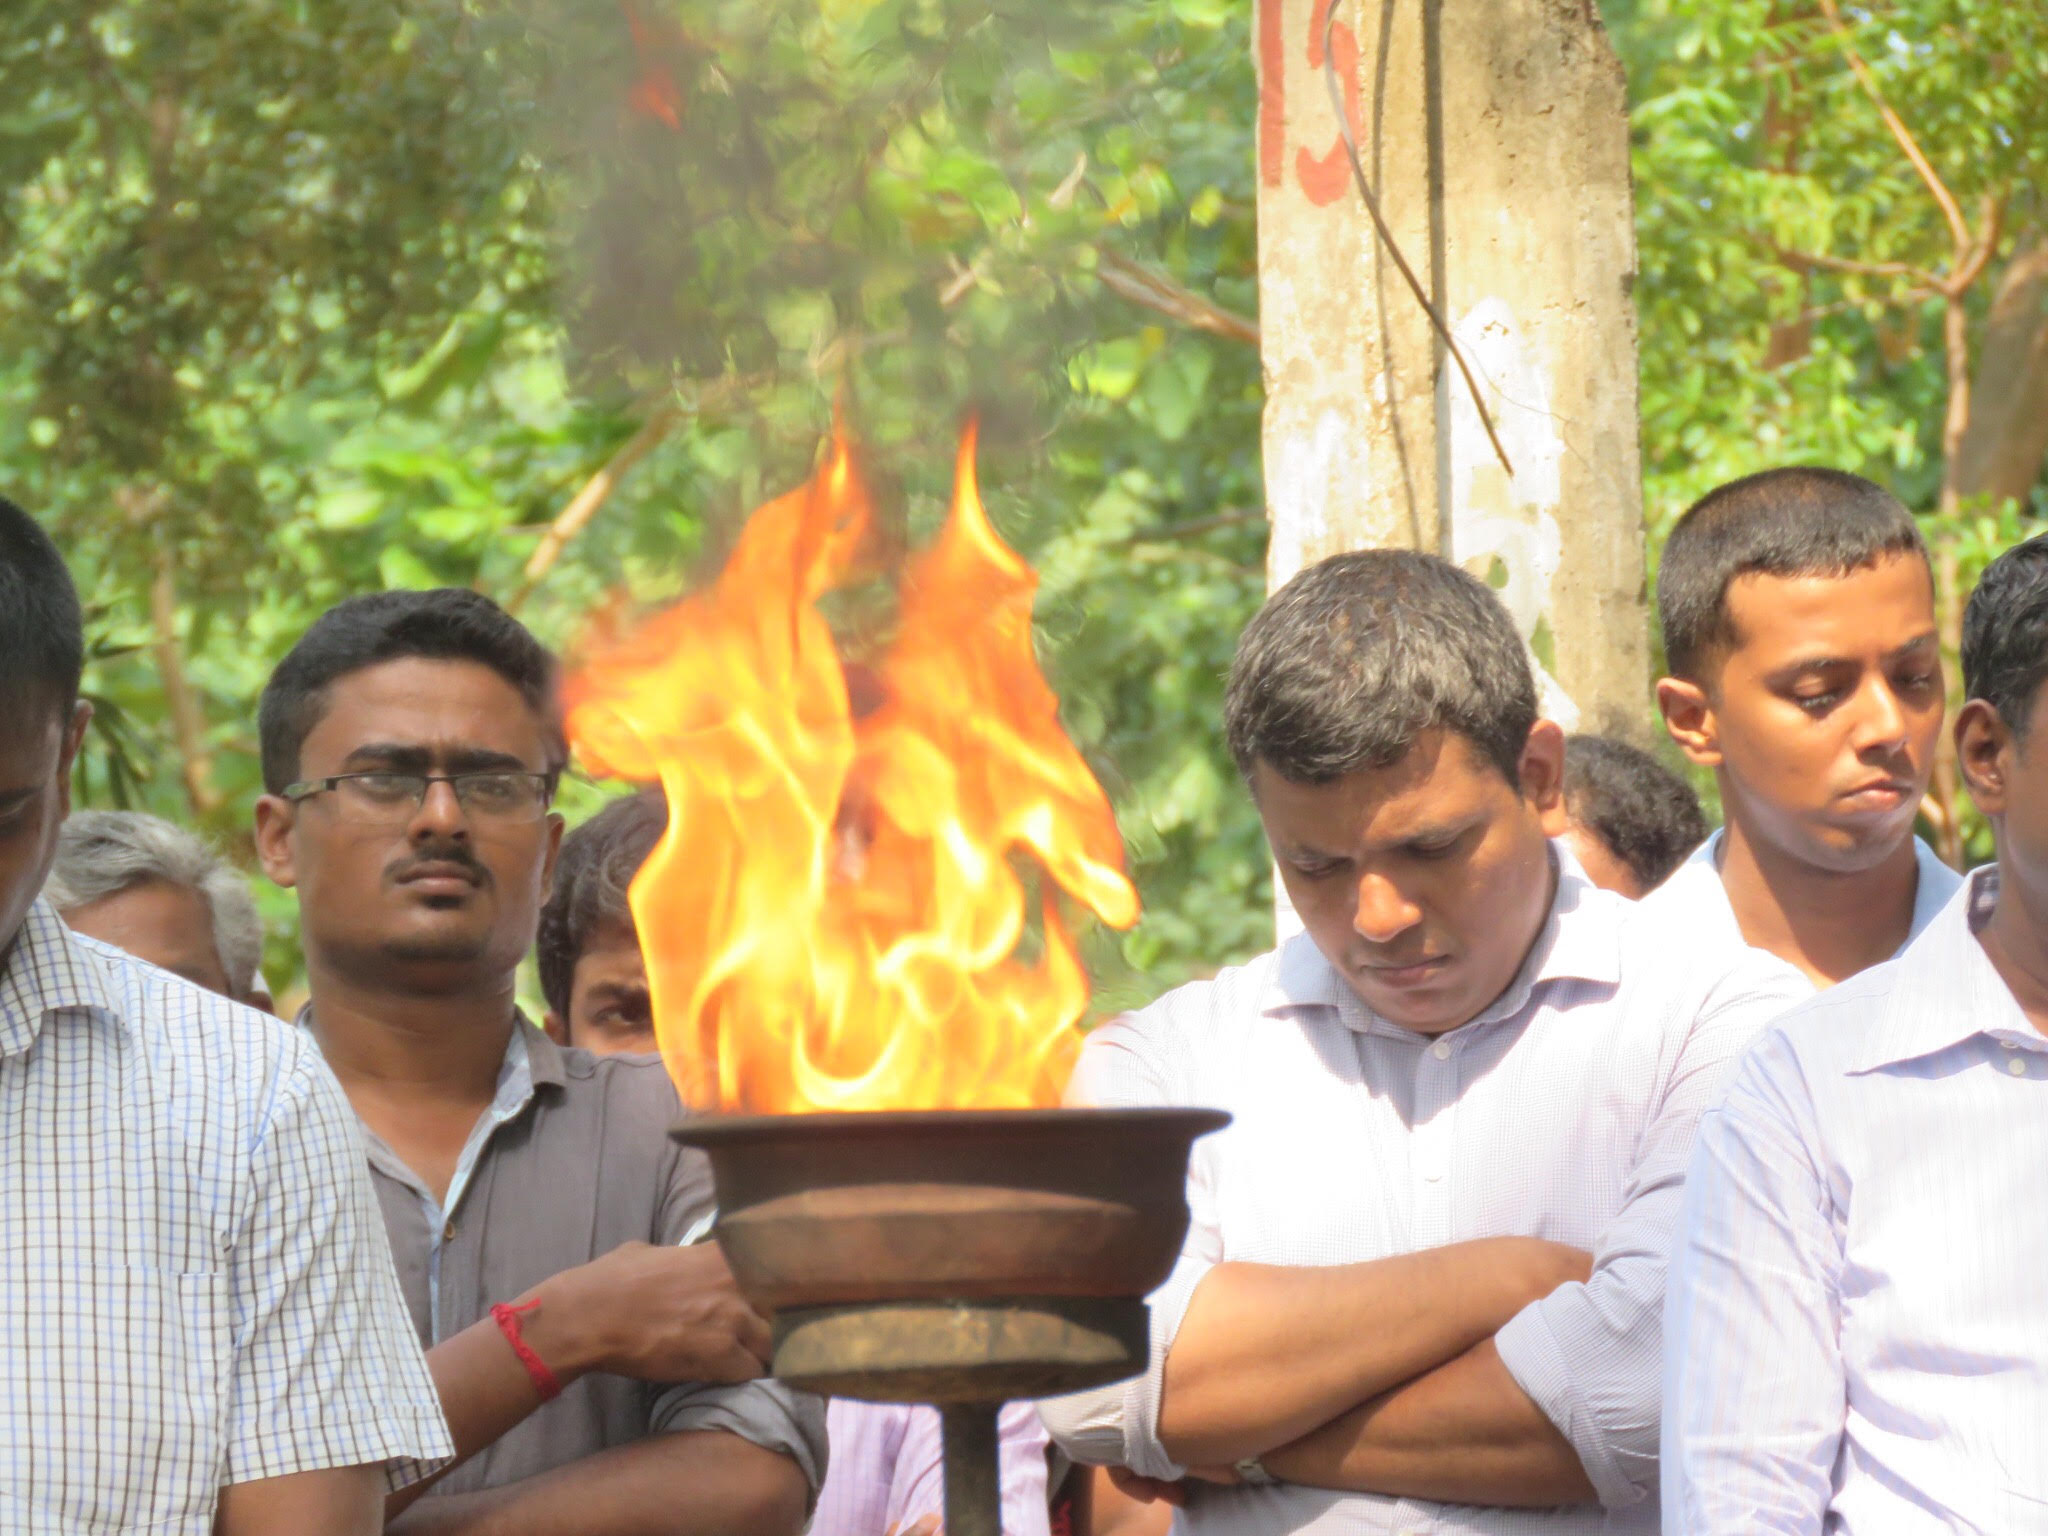 Sri Lanka Massacred Tens of Thousands of Tamils | Pulitzer